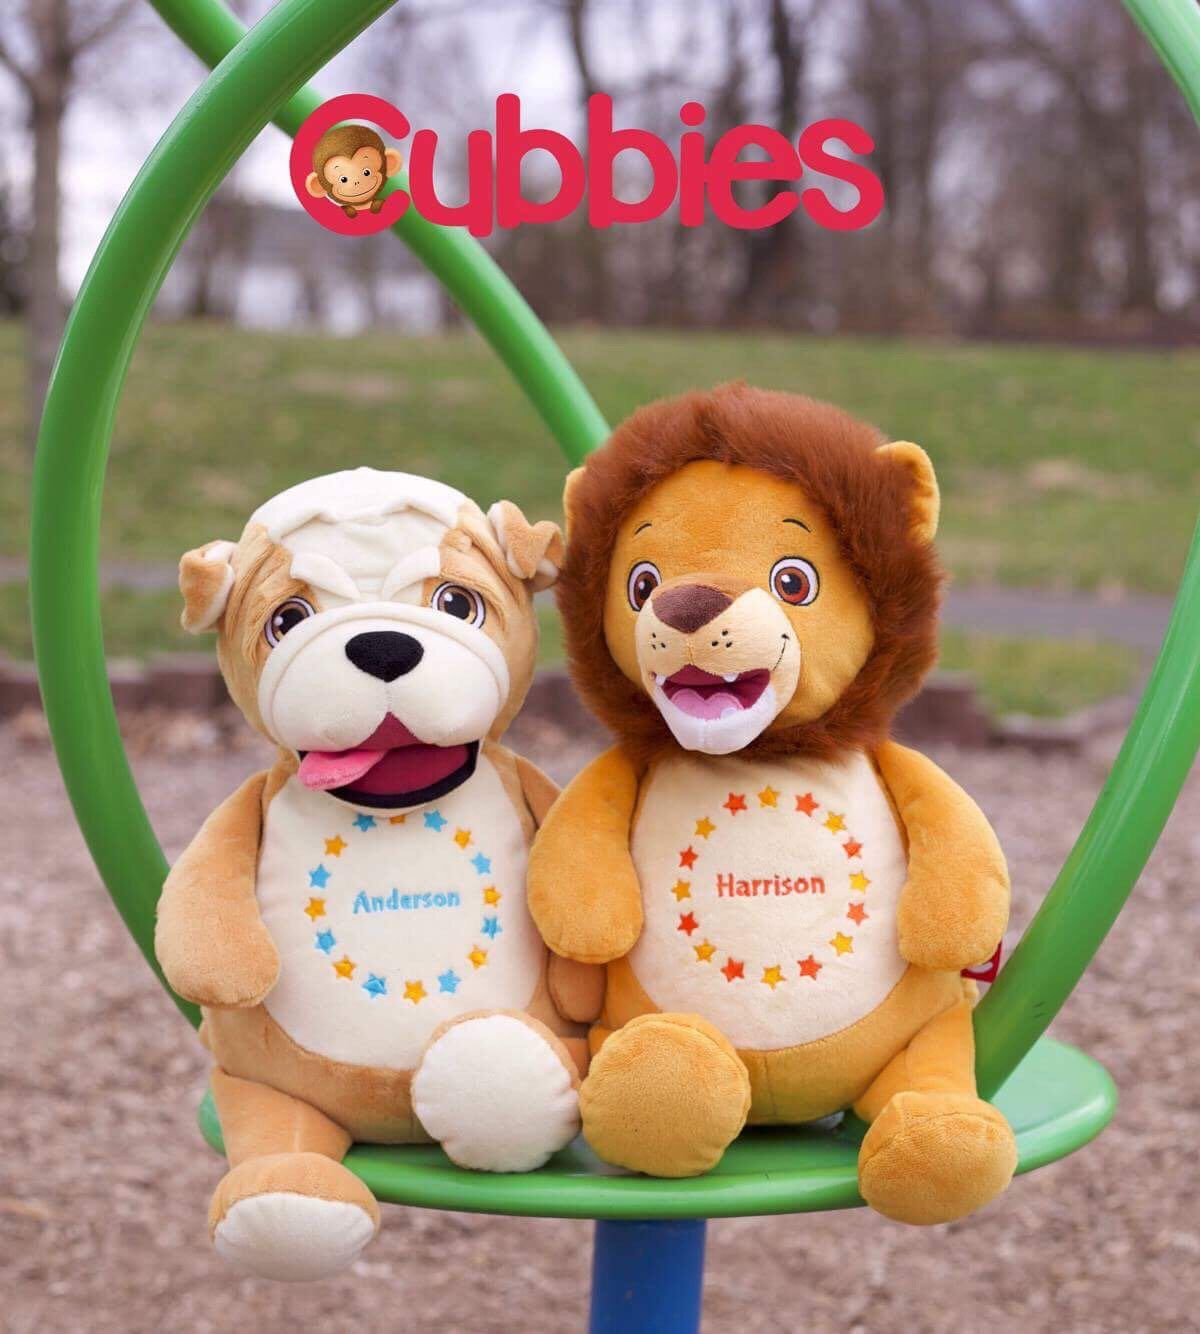 Custom Baby Cubbie, Personalized Stuffed Animal, Plush Toy